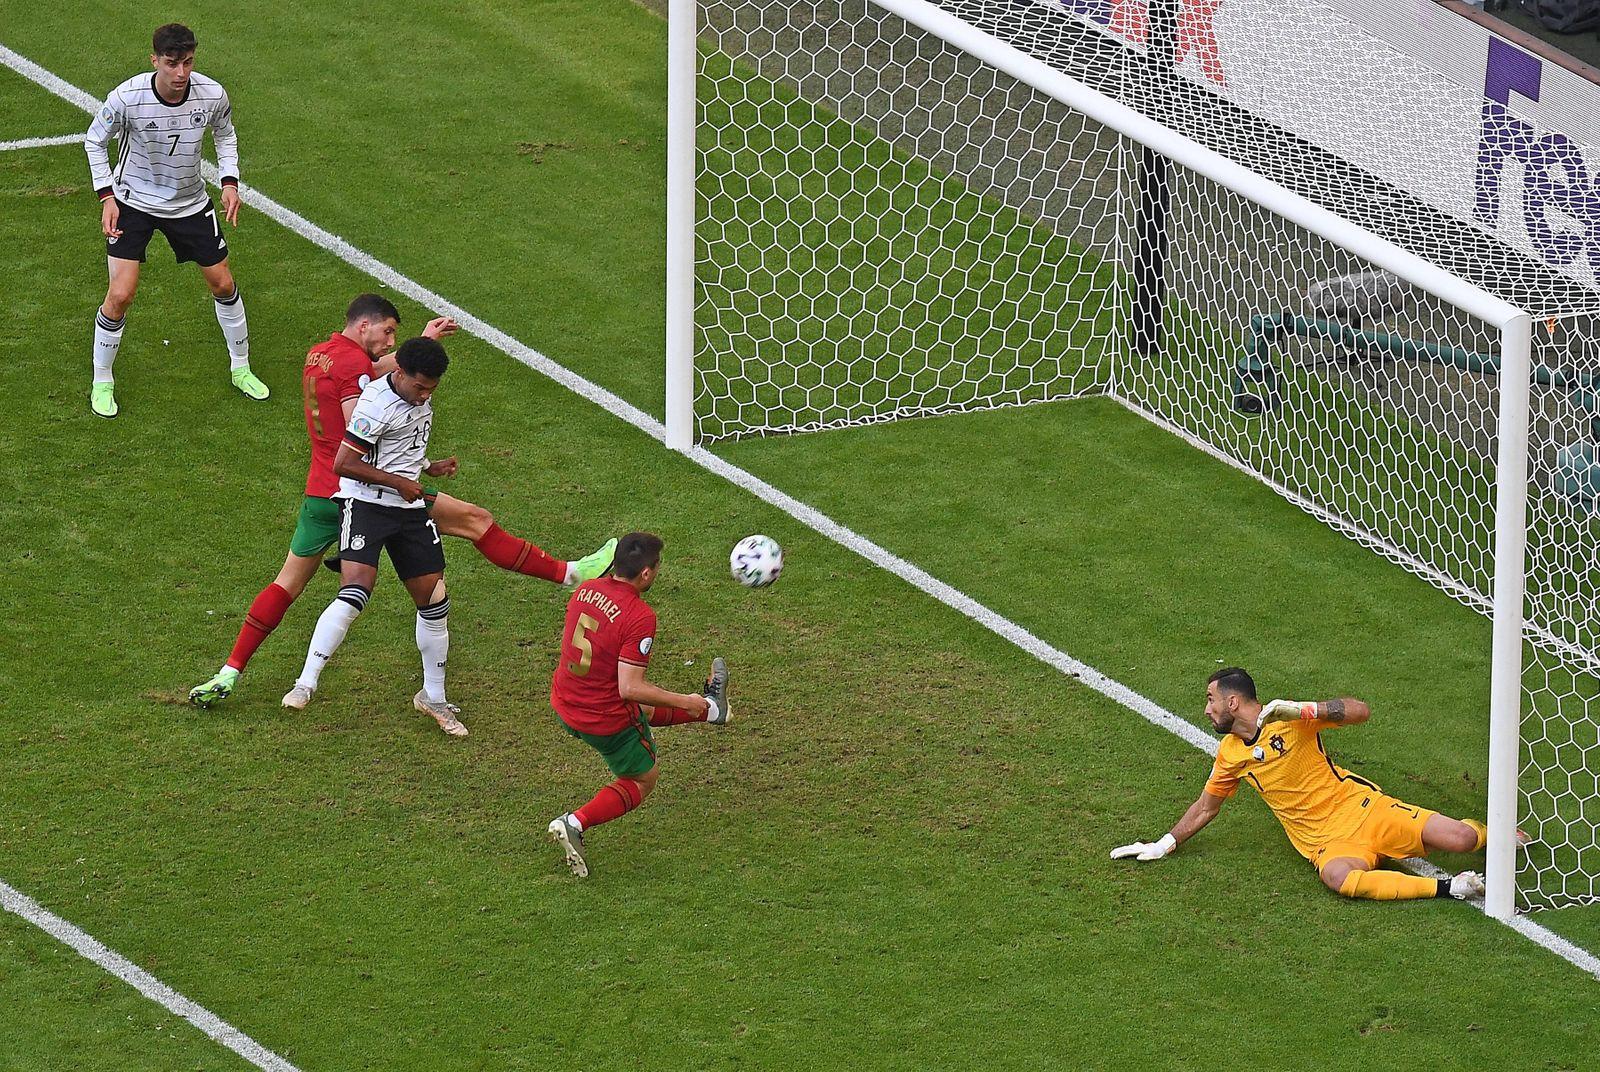 19.06.2021, xjhx, Fussball Europameisterschaft 2020 Gruppe F, Deutschland - Portugal emspor, v.l. Raphael Guerreiro (Por